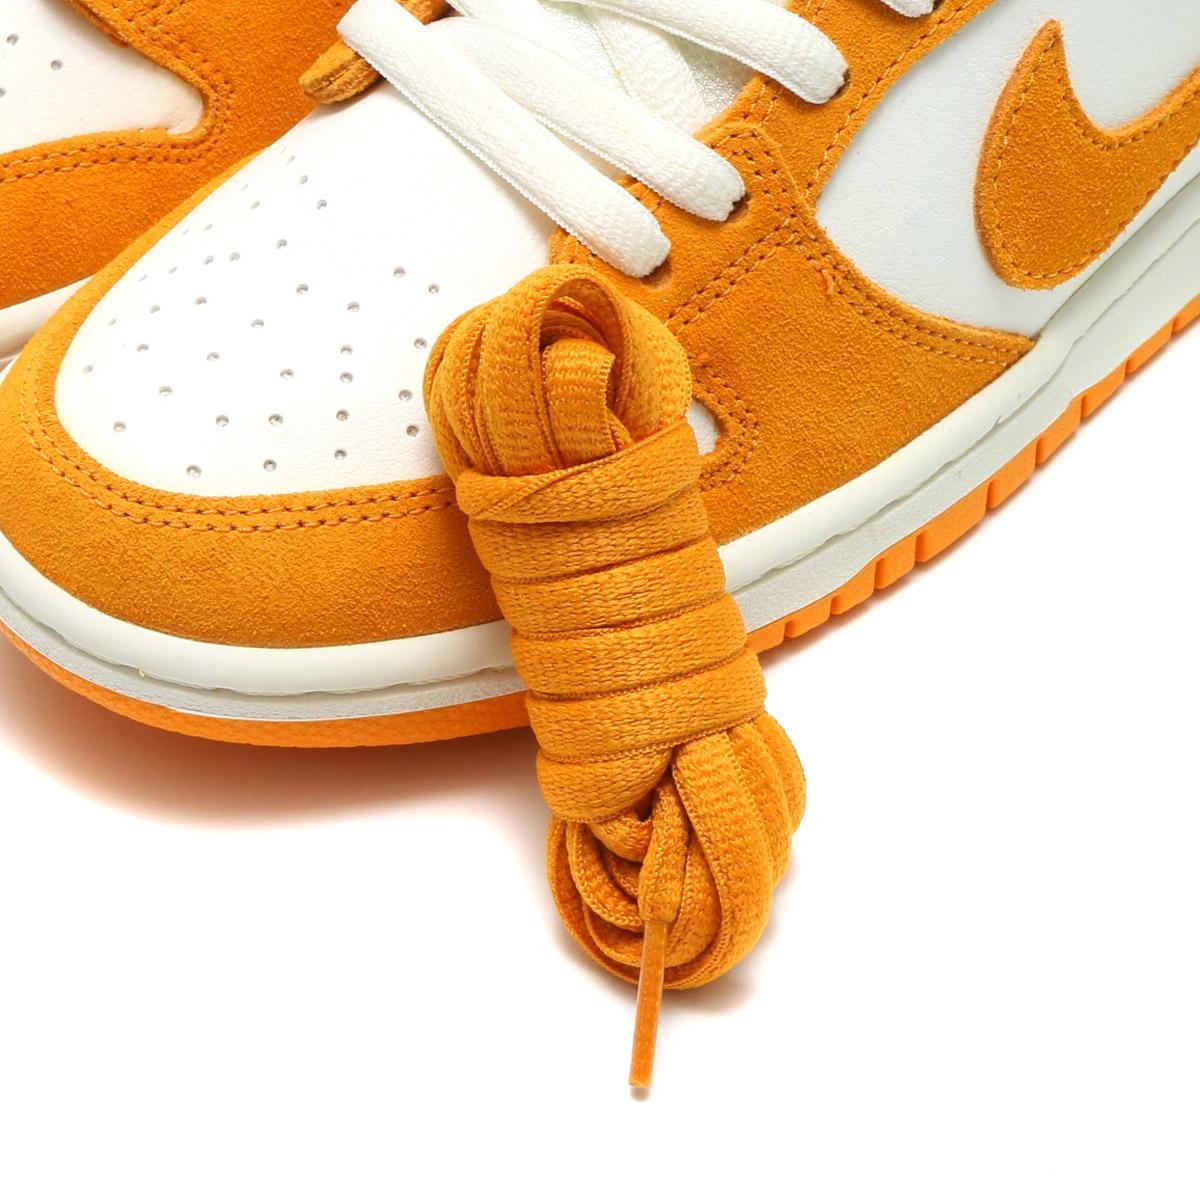 half off eebef 5f05c NIKE SB ZOOM DUNK LOW PRO (Nike Nike SB zoom dunk low pro) (CIRCUIT ORANGE CIRCUIT  ORANGE-SAIL) 17FA-S